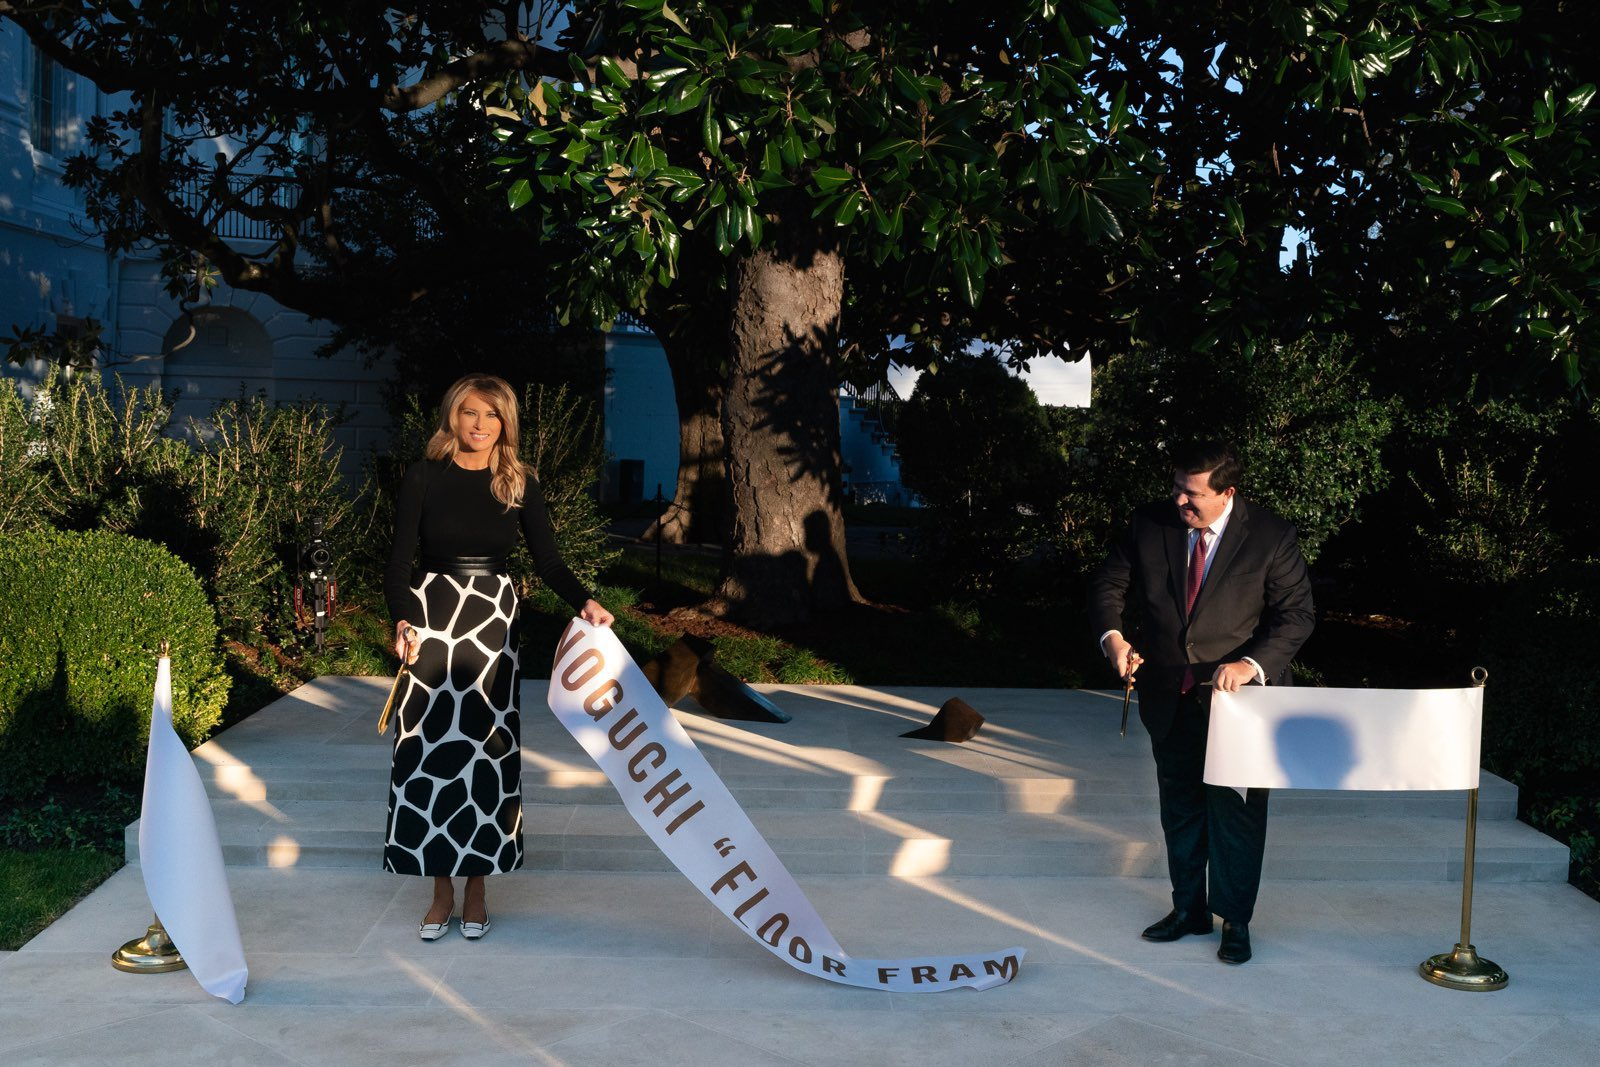 Melania Trump Just Had This 'Humble' Isamu Noguchi Sculpture Installed at the White House Rose Garden | artnet News